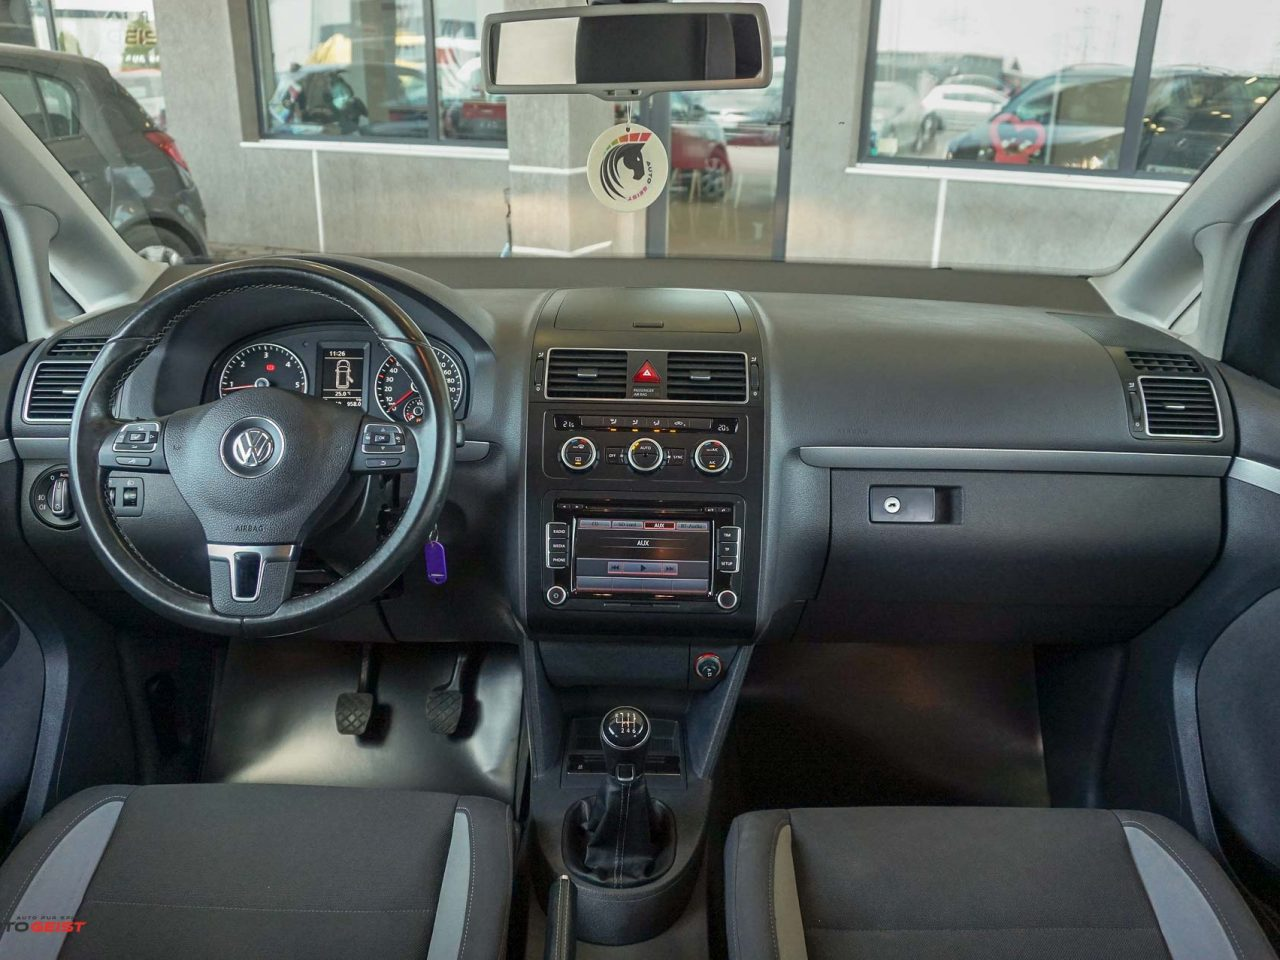 661-volkswagen-touran-gri-manual-01836